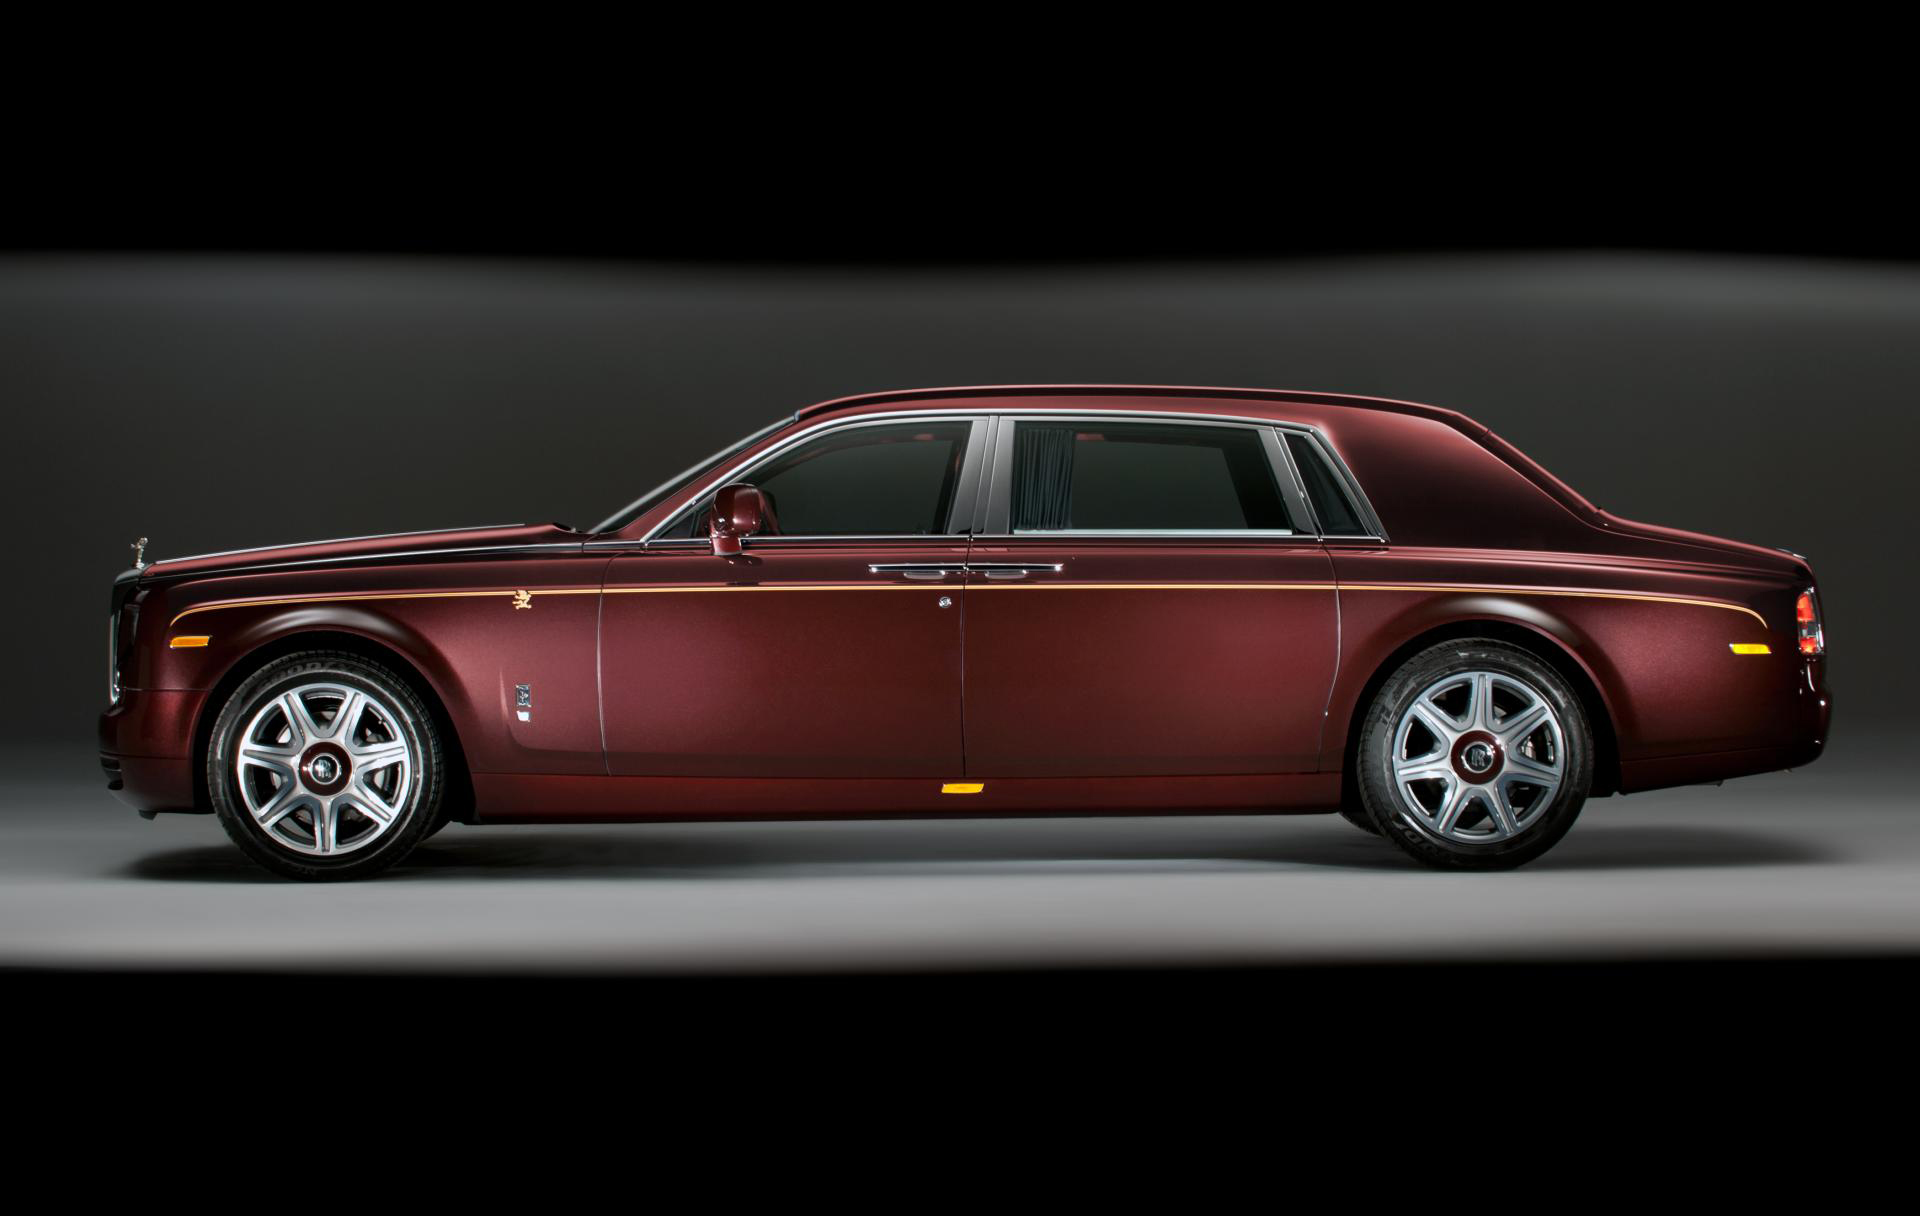 2012 RollsRoyce Phantom Dragon Collection  conceptcarzcom